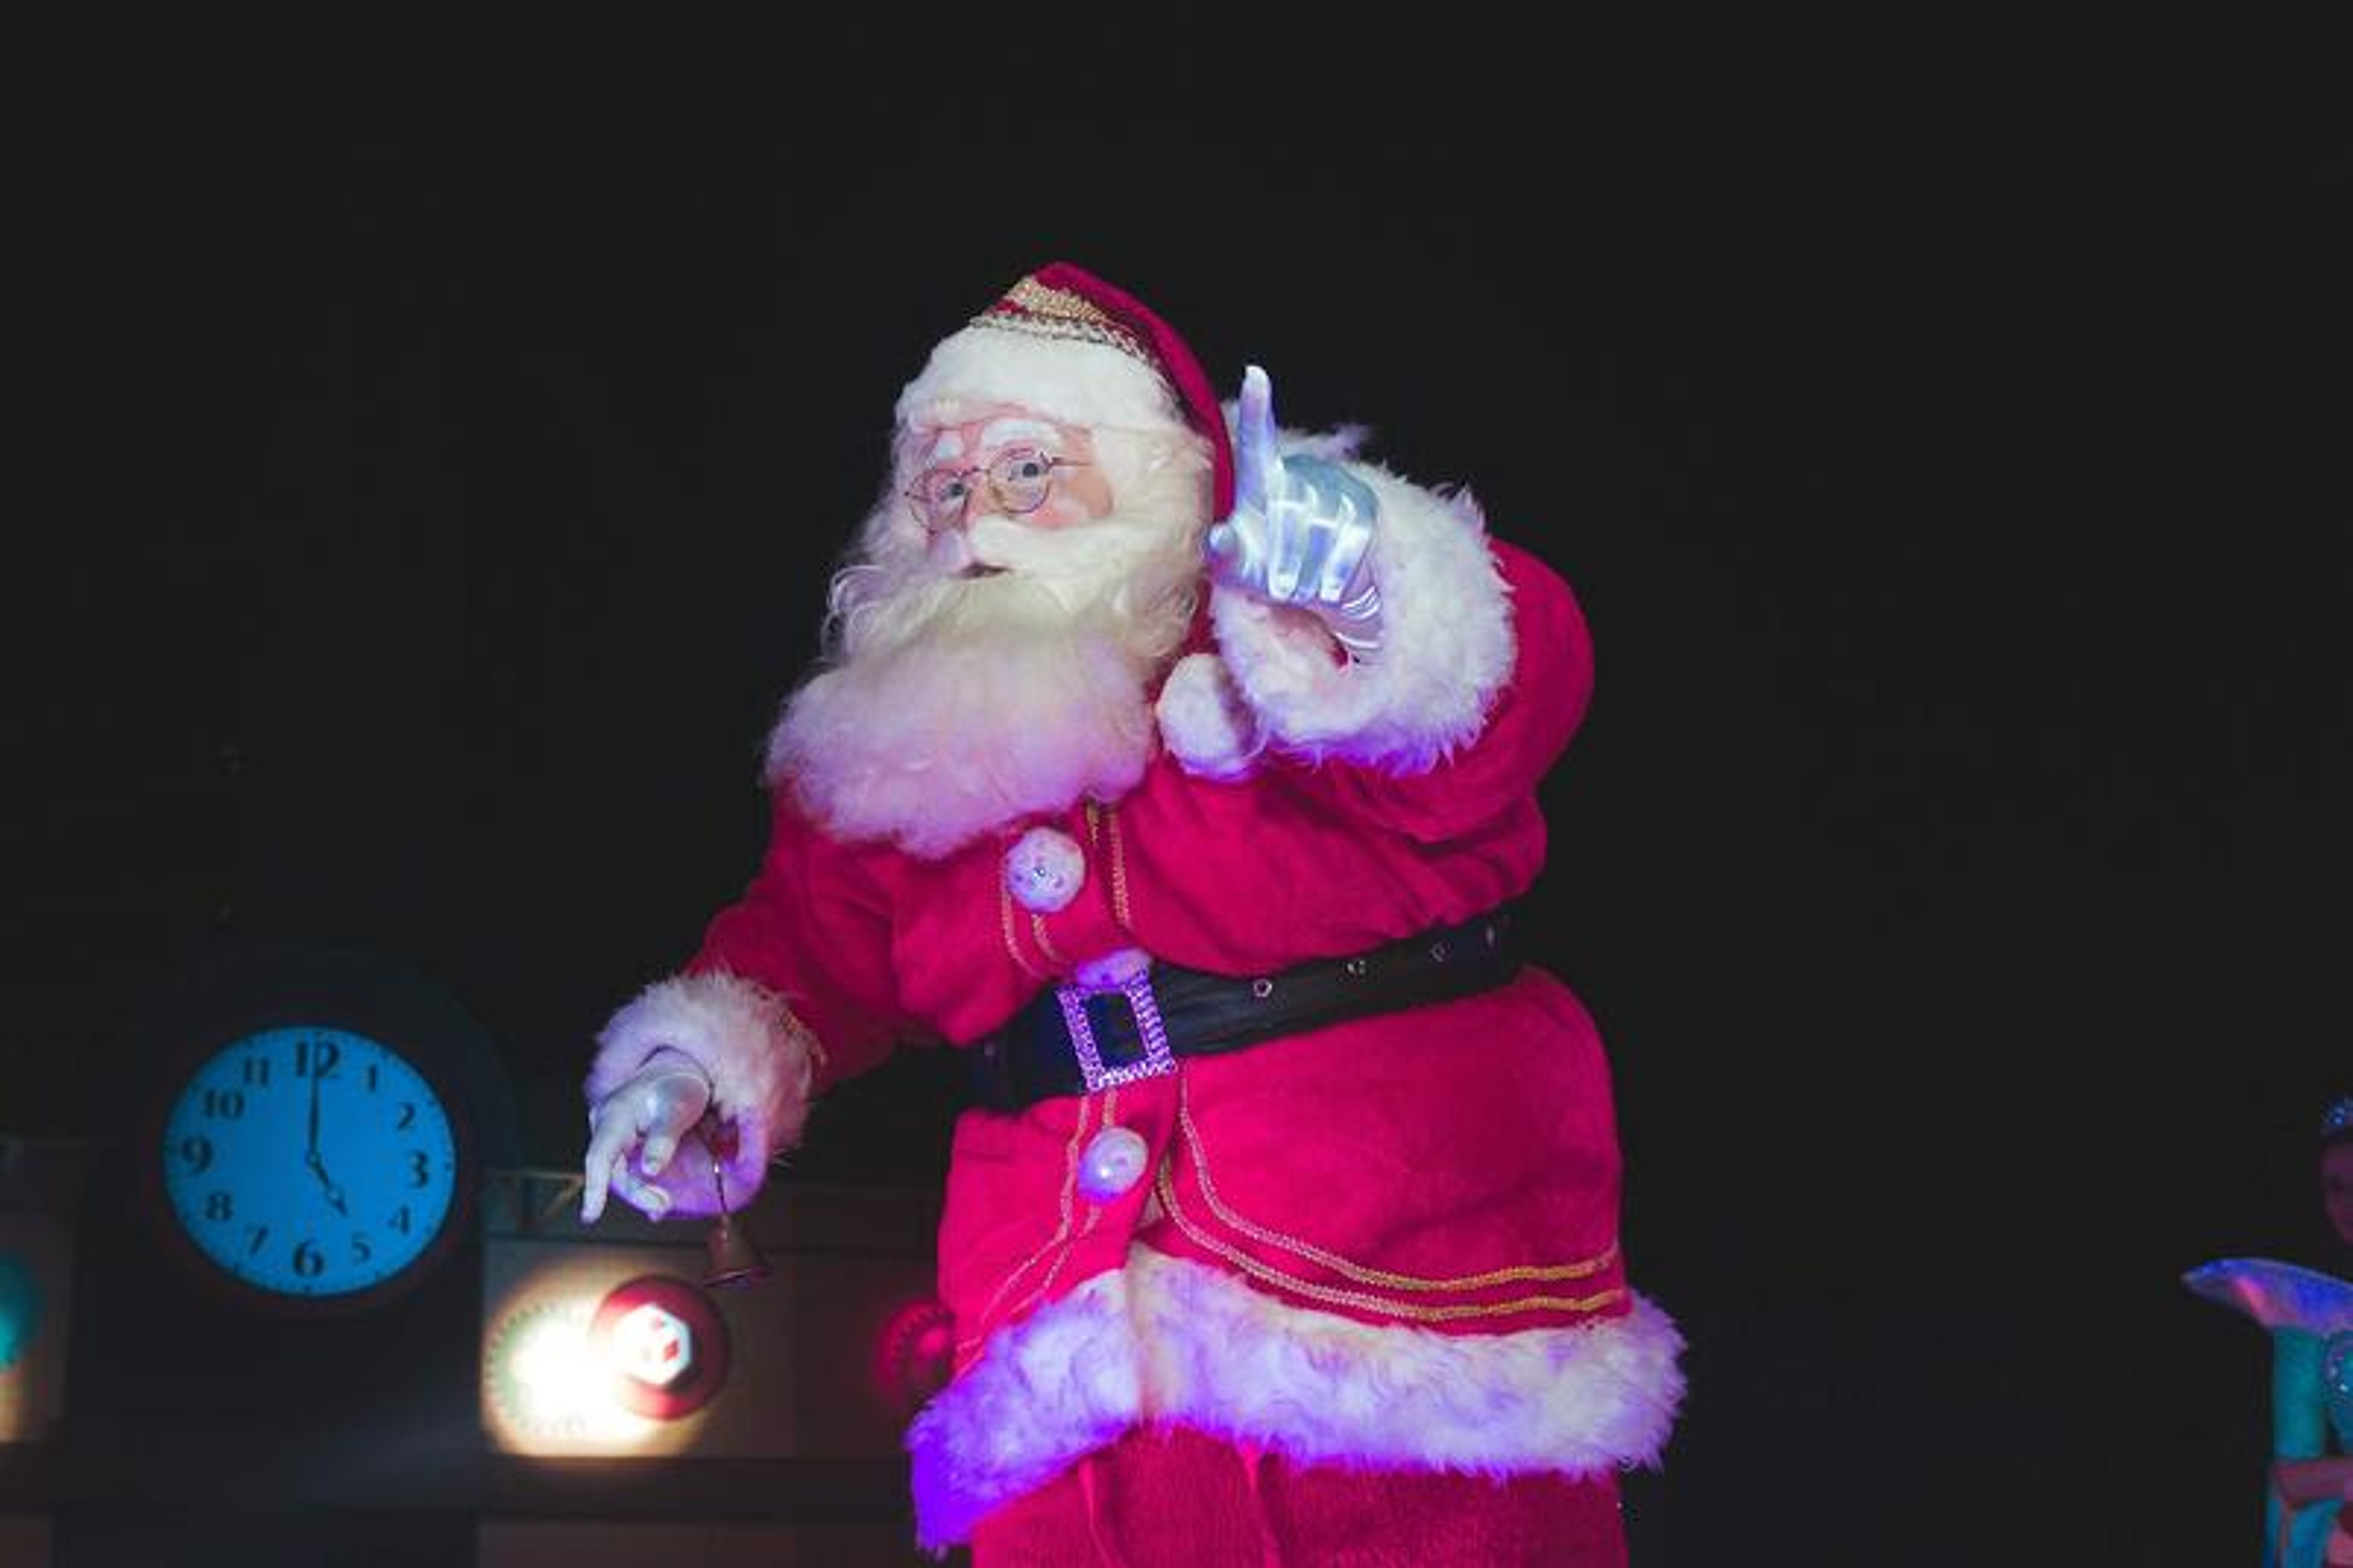 Santa clause at 5am on a dark morning, pointing at the sky